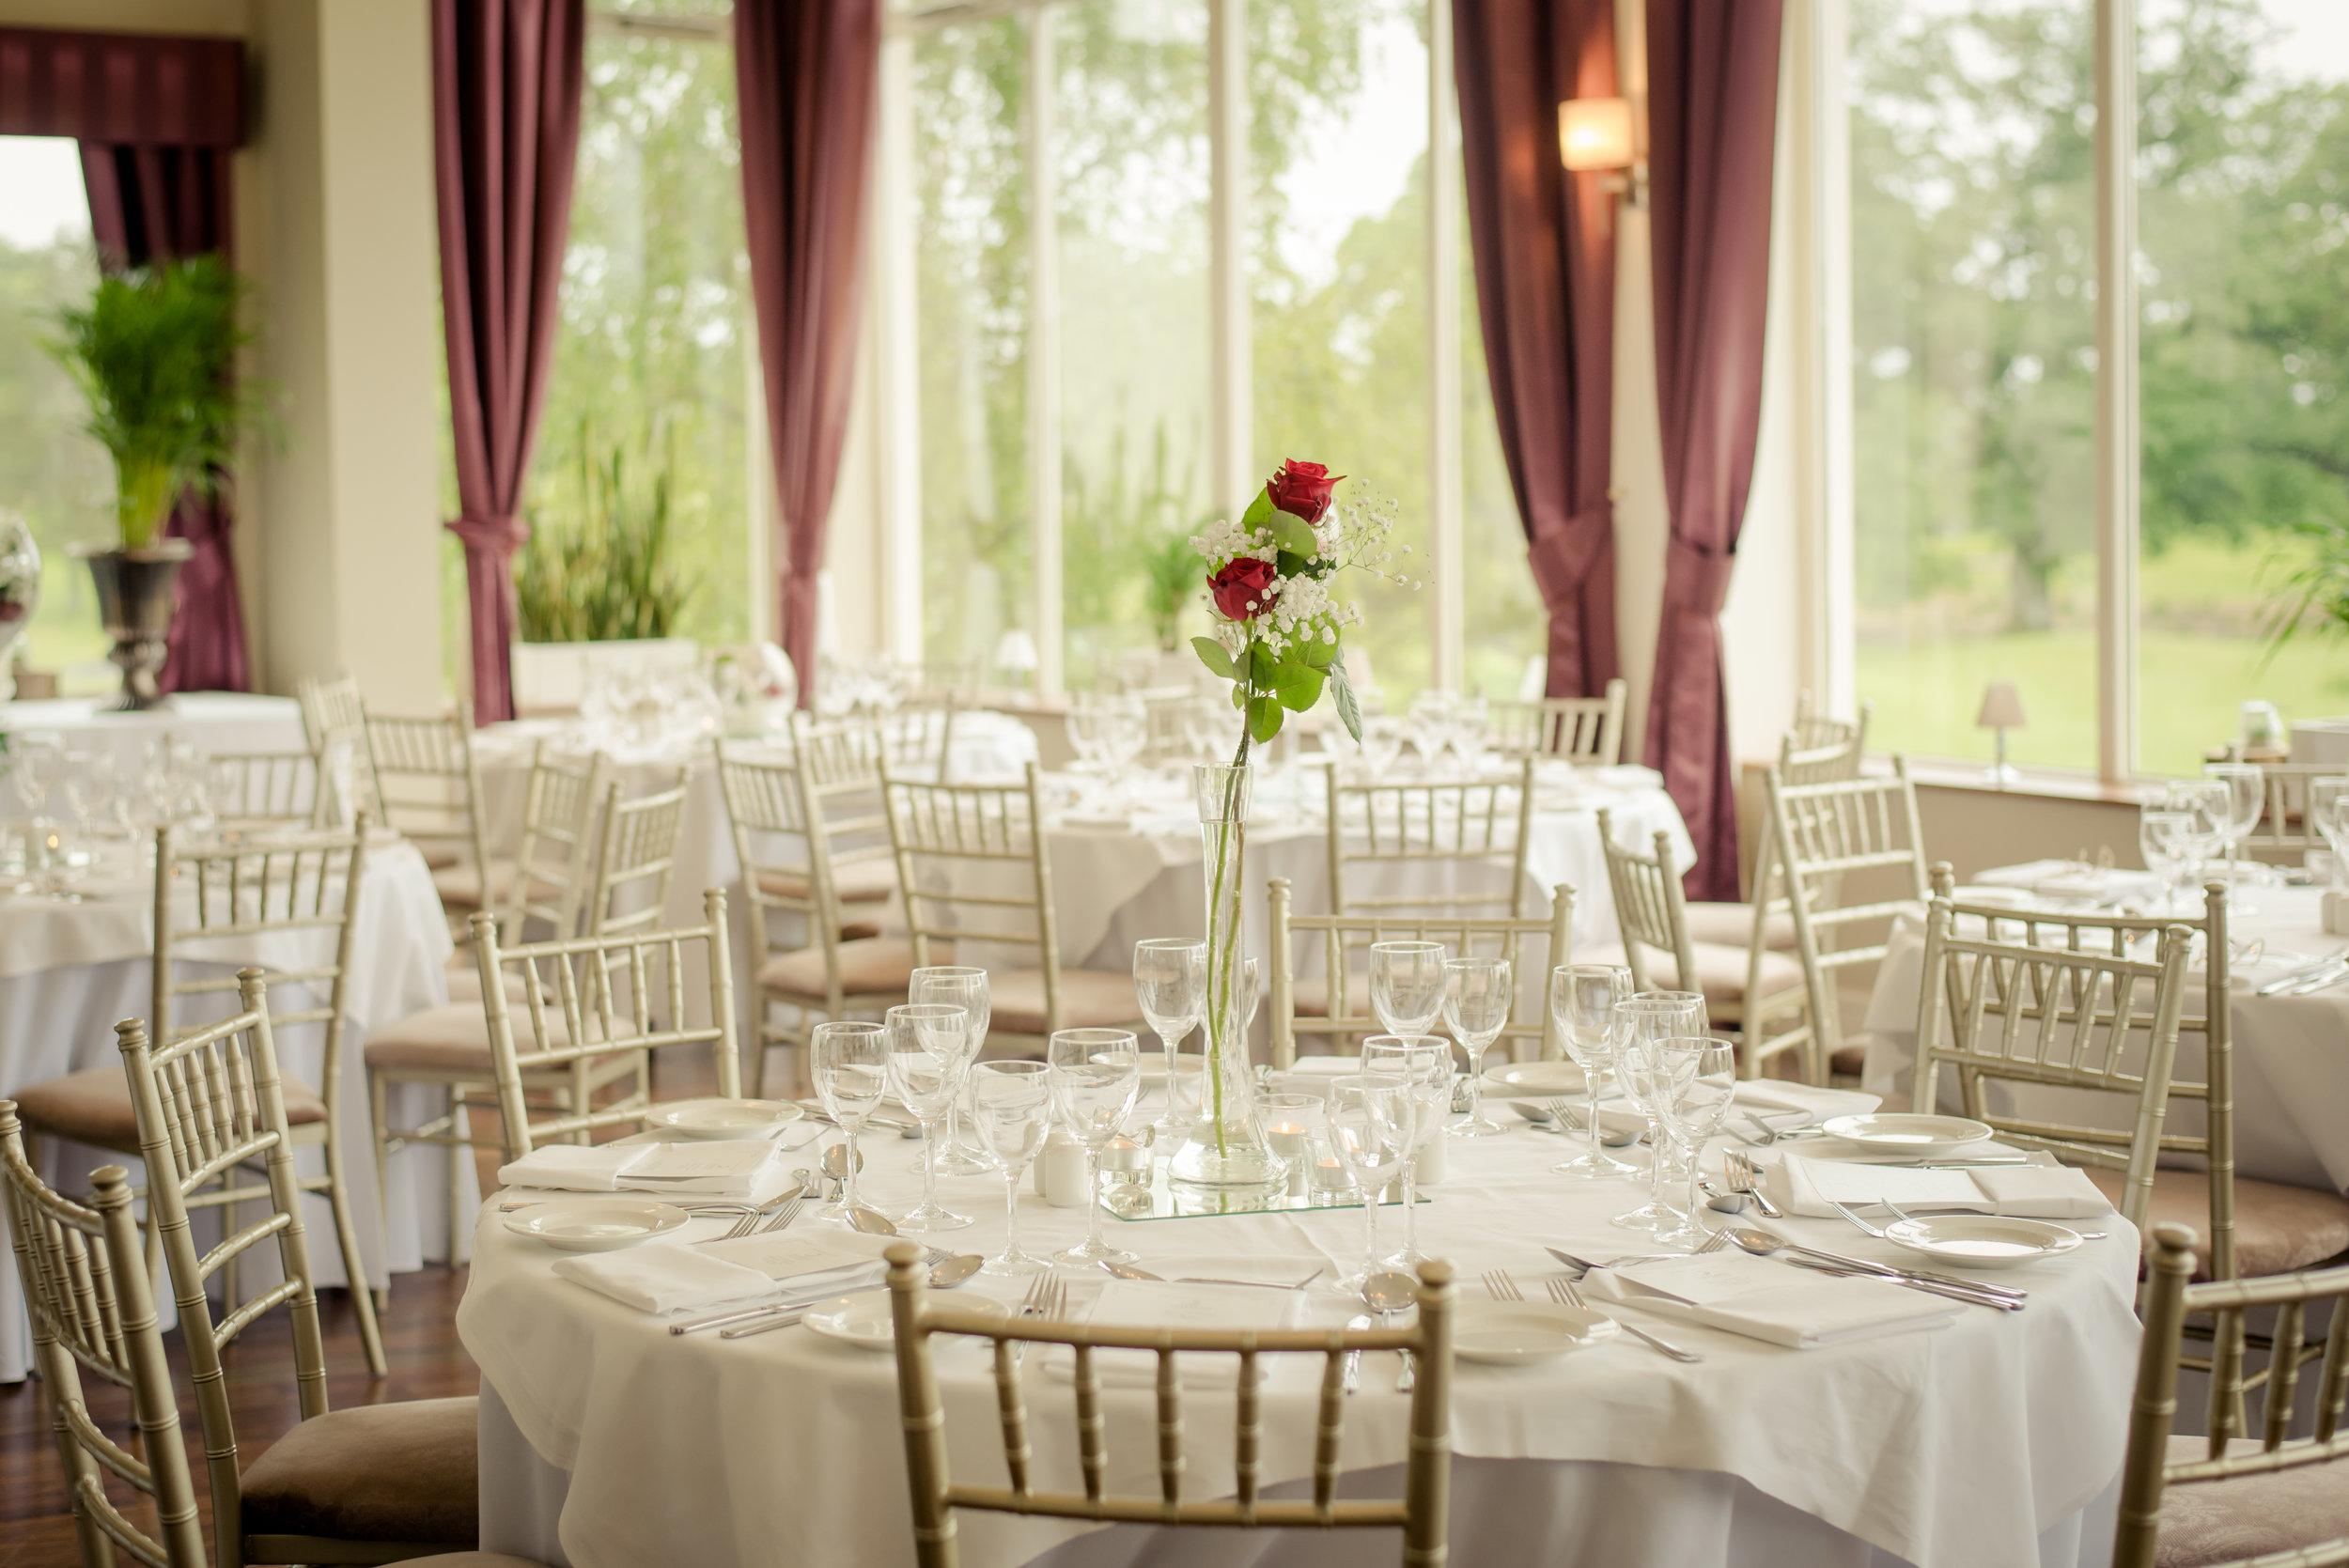 Tulfarris Hotel & Golf Resort Lime Tree Restaurant intimate wedding setting.jpg